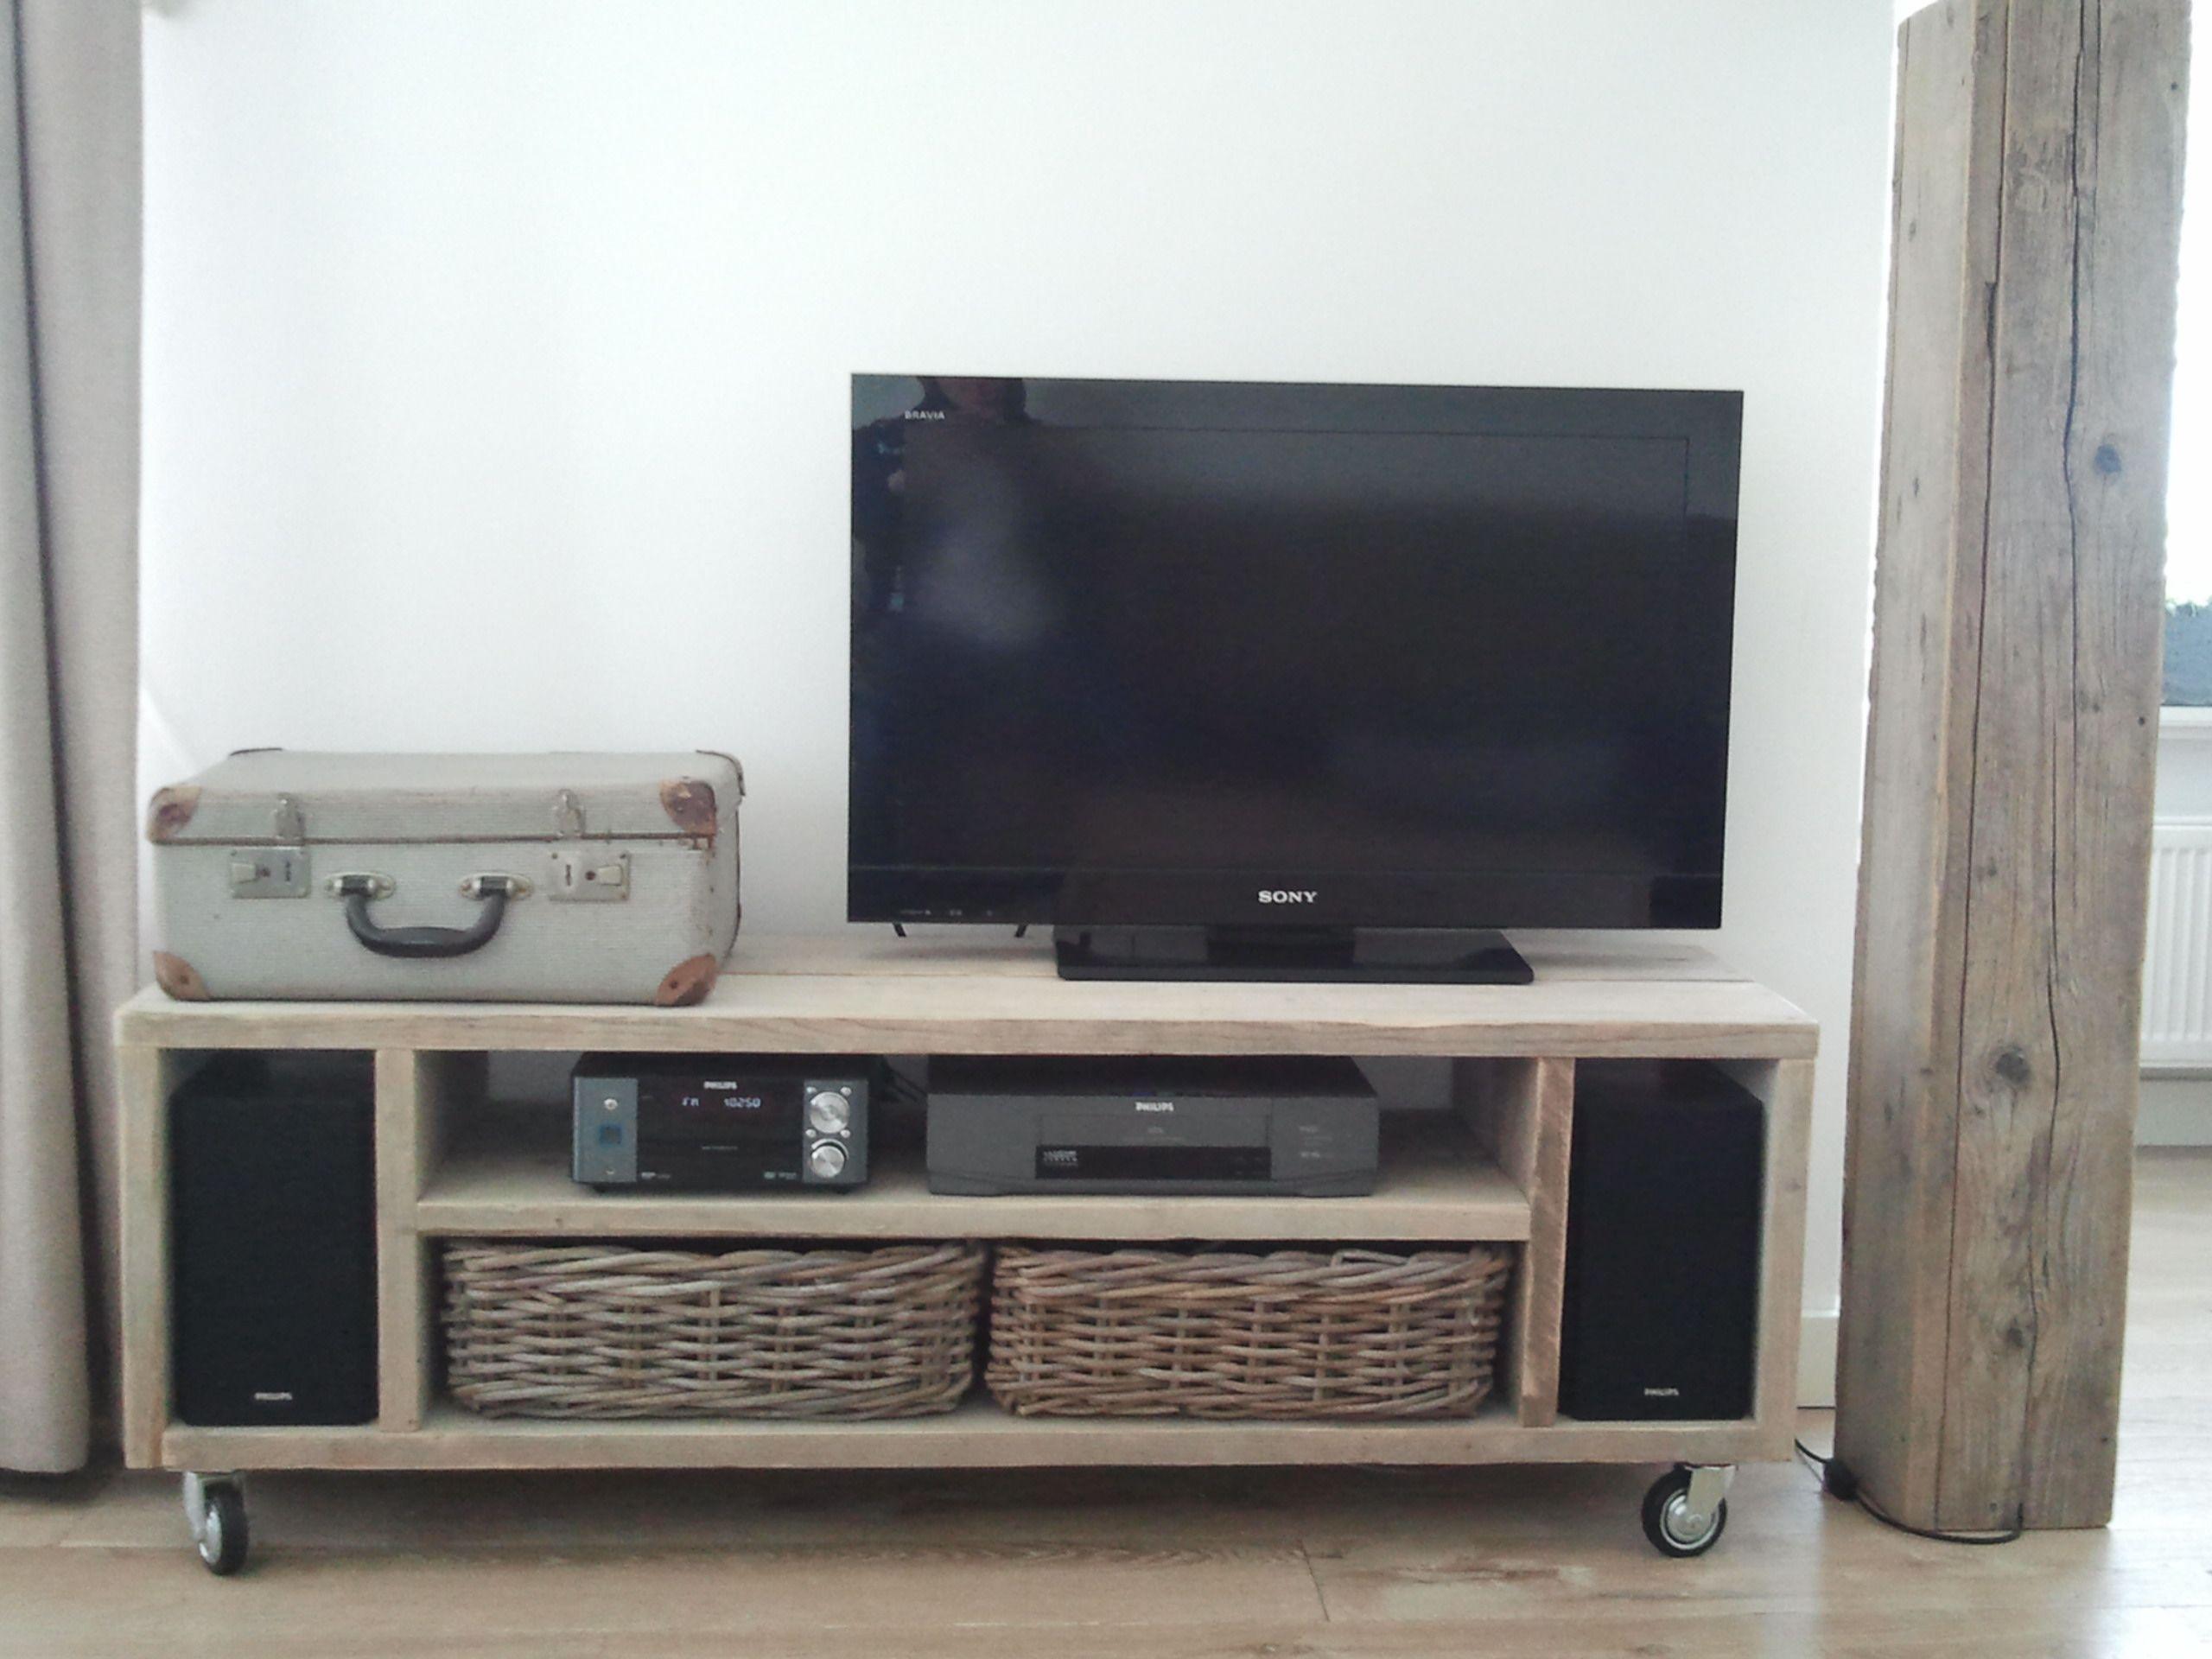 Tv Kast Nl : Tv kast op wielen van steigerhout natuurlijk steigerhoutholland